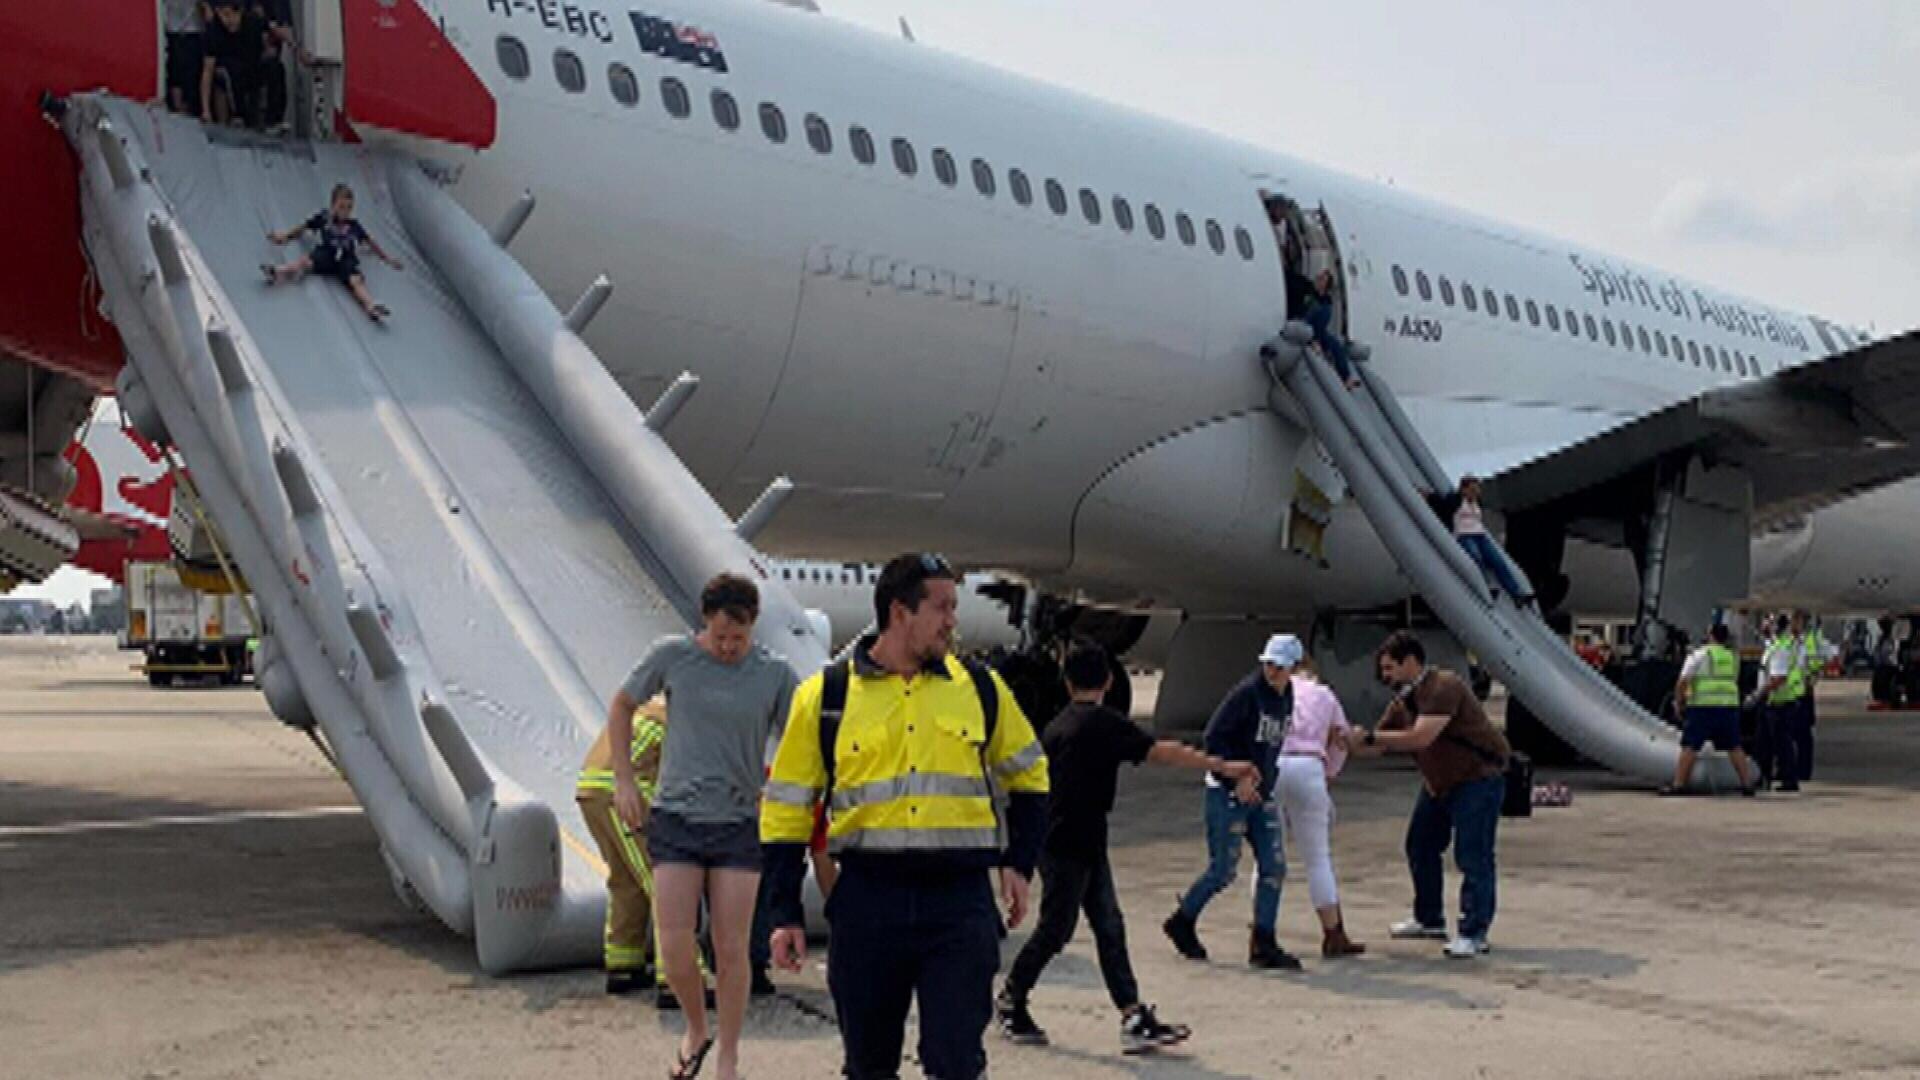 'Evacuate, evacuate, evacuate!': Passengers sent down slides as cabin fills with hydraulic fluid